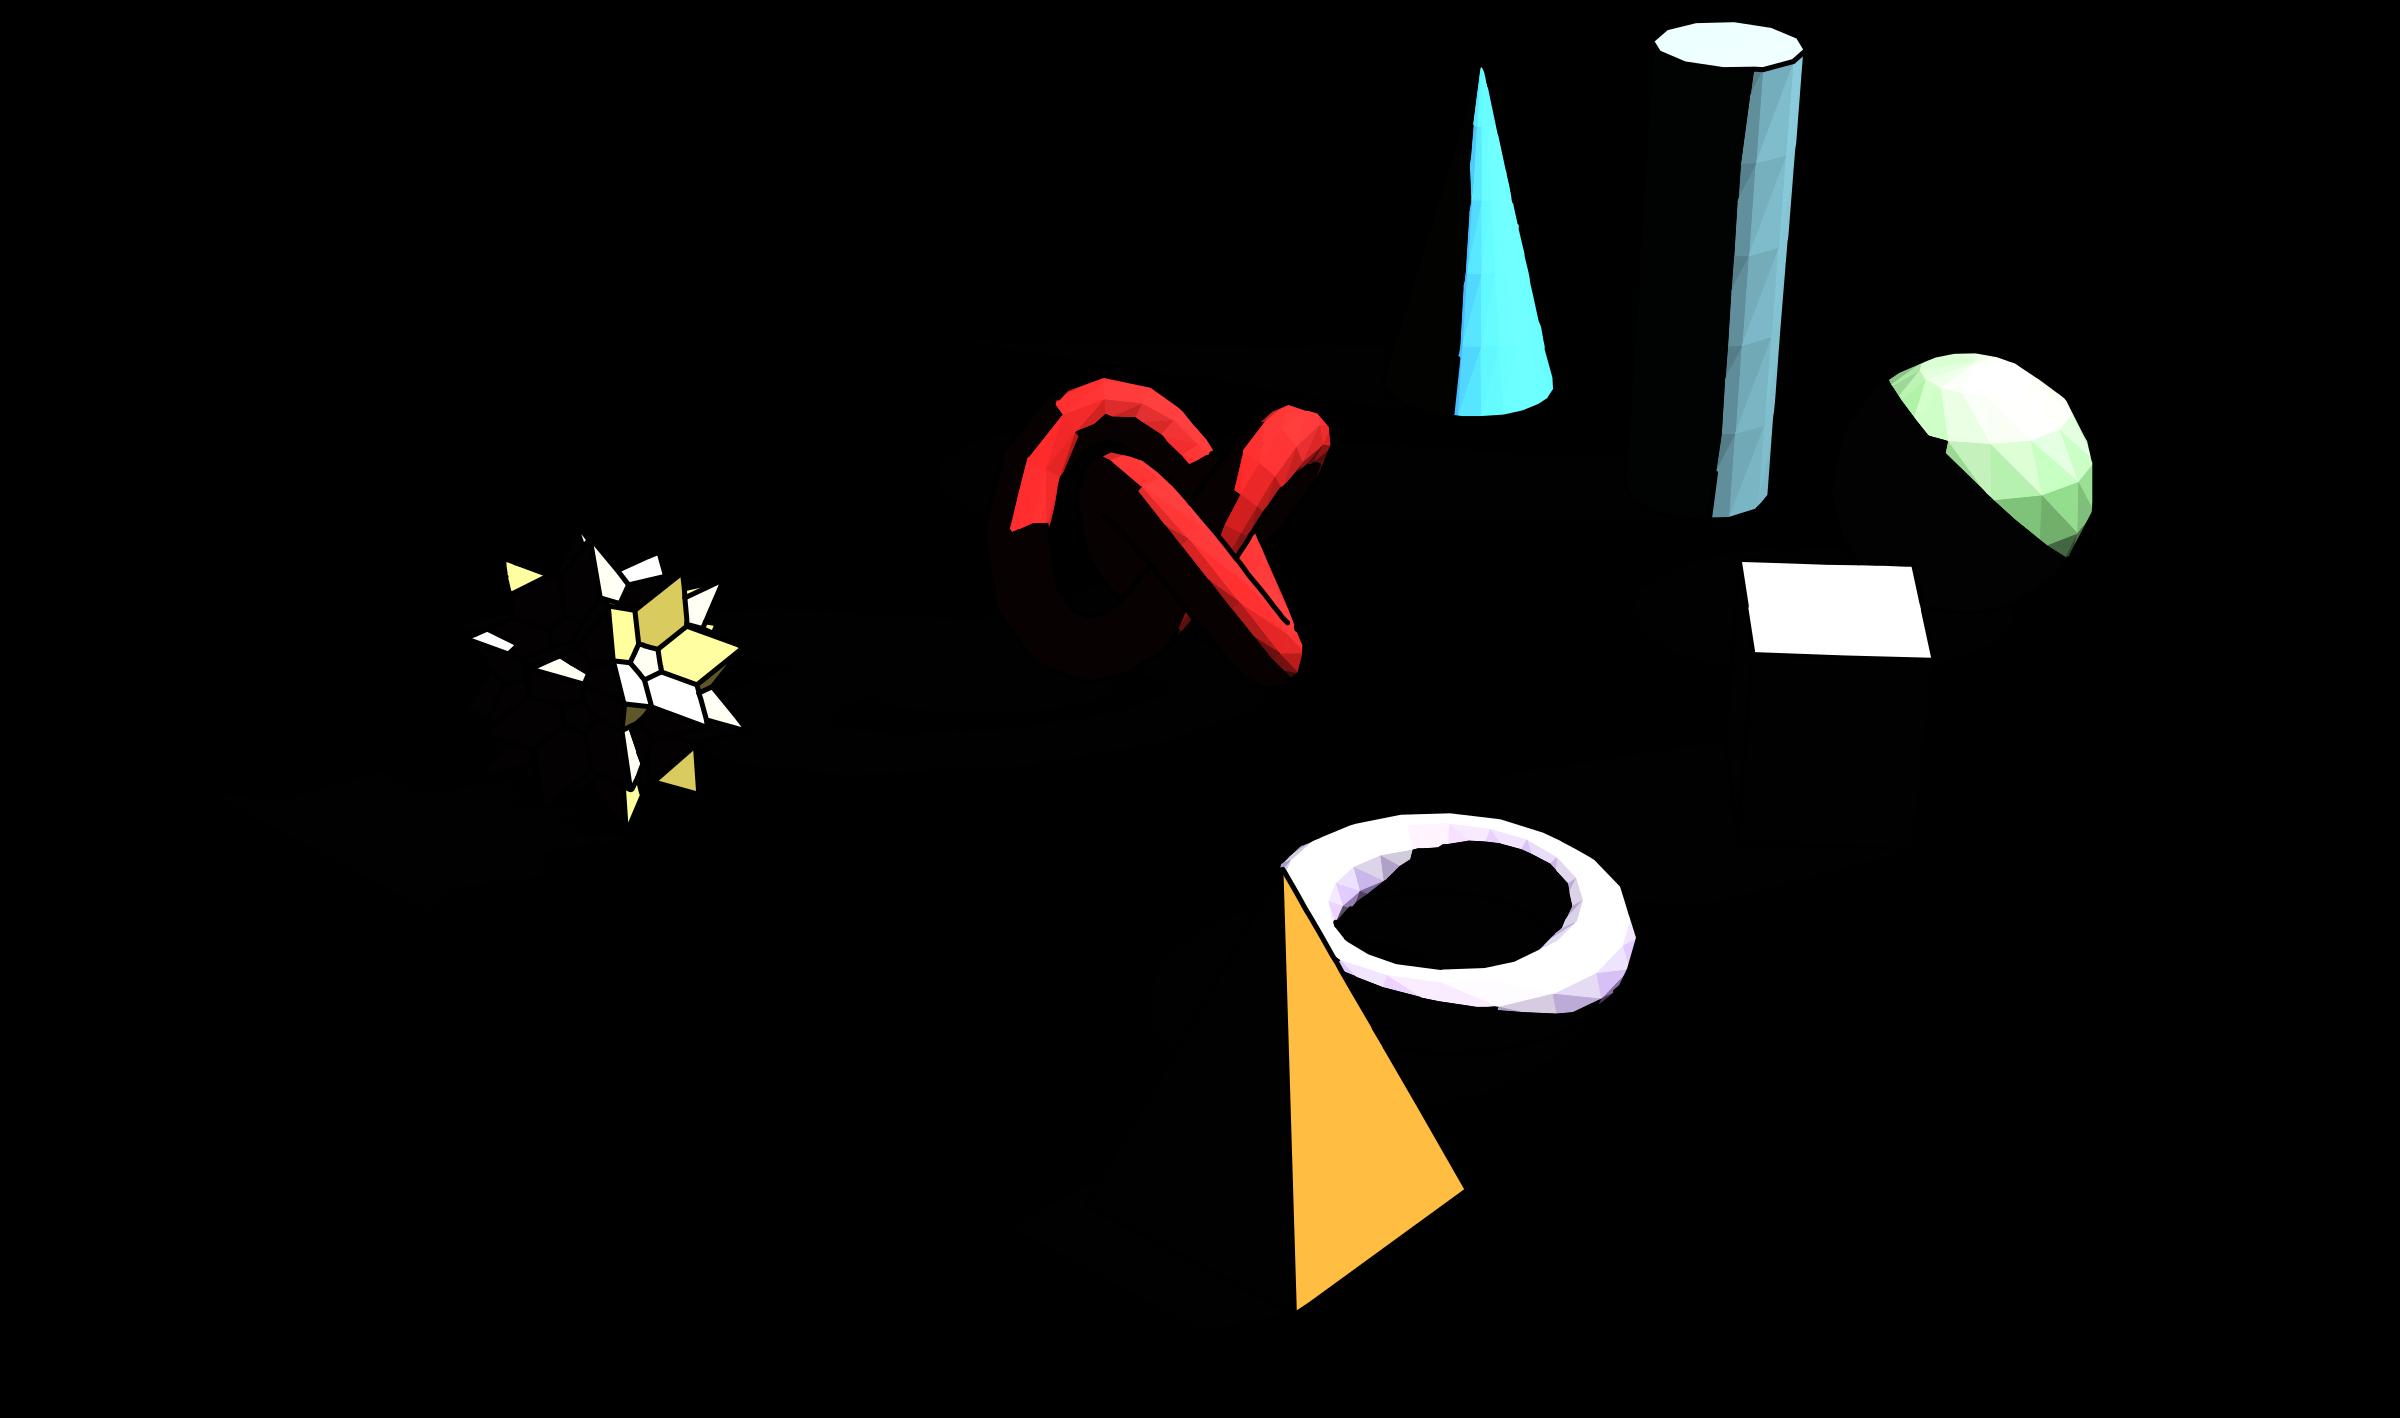 Geometric shapes big image. Geometry clipart 3d shape